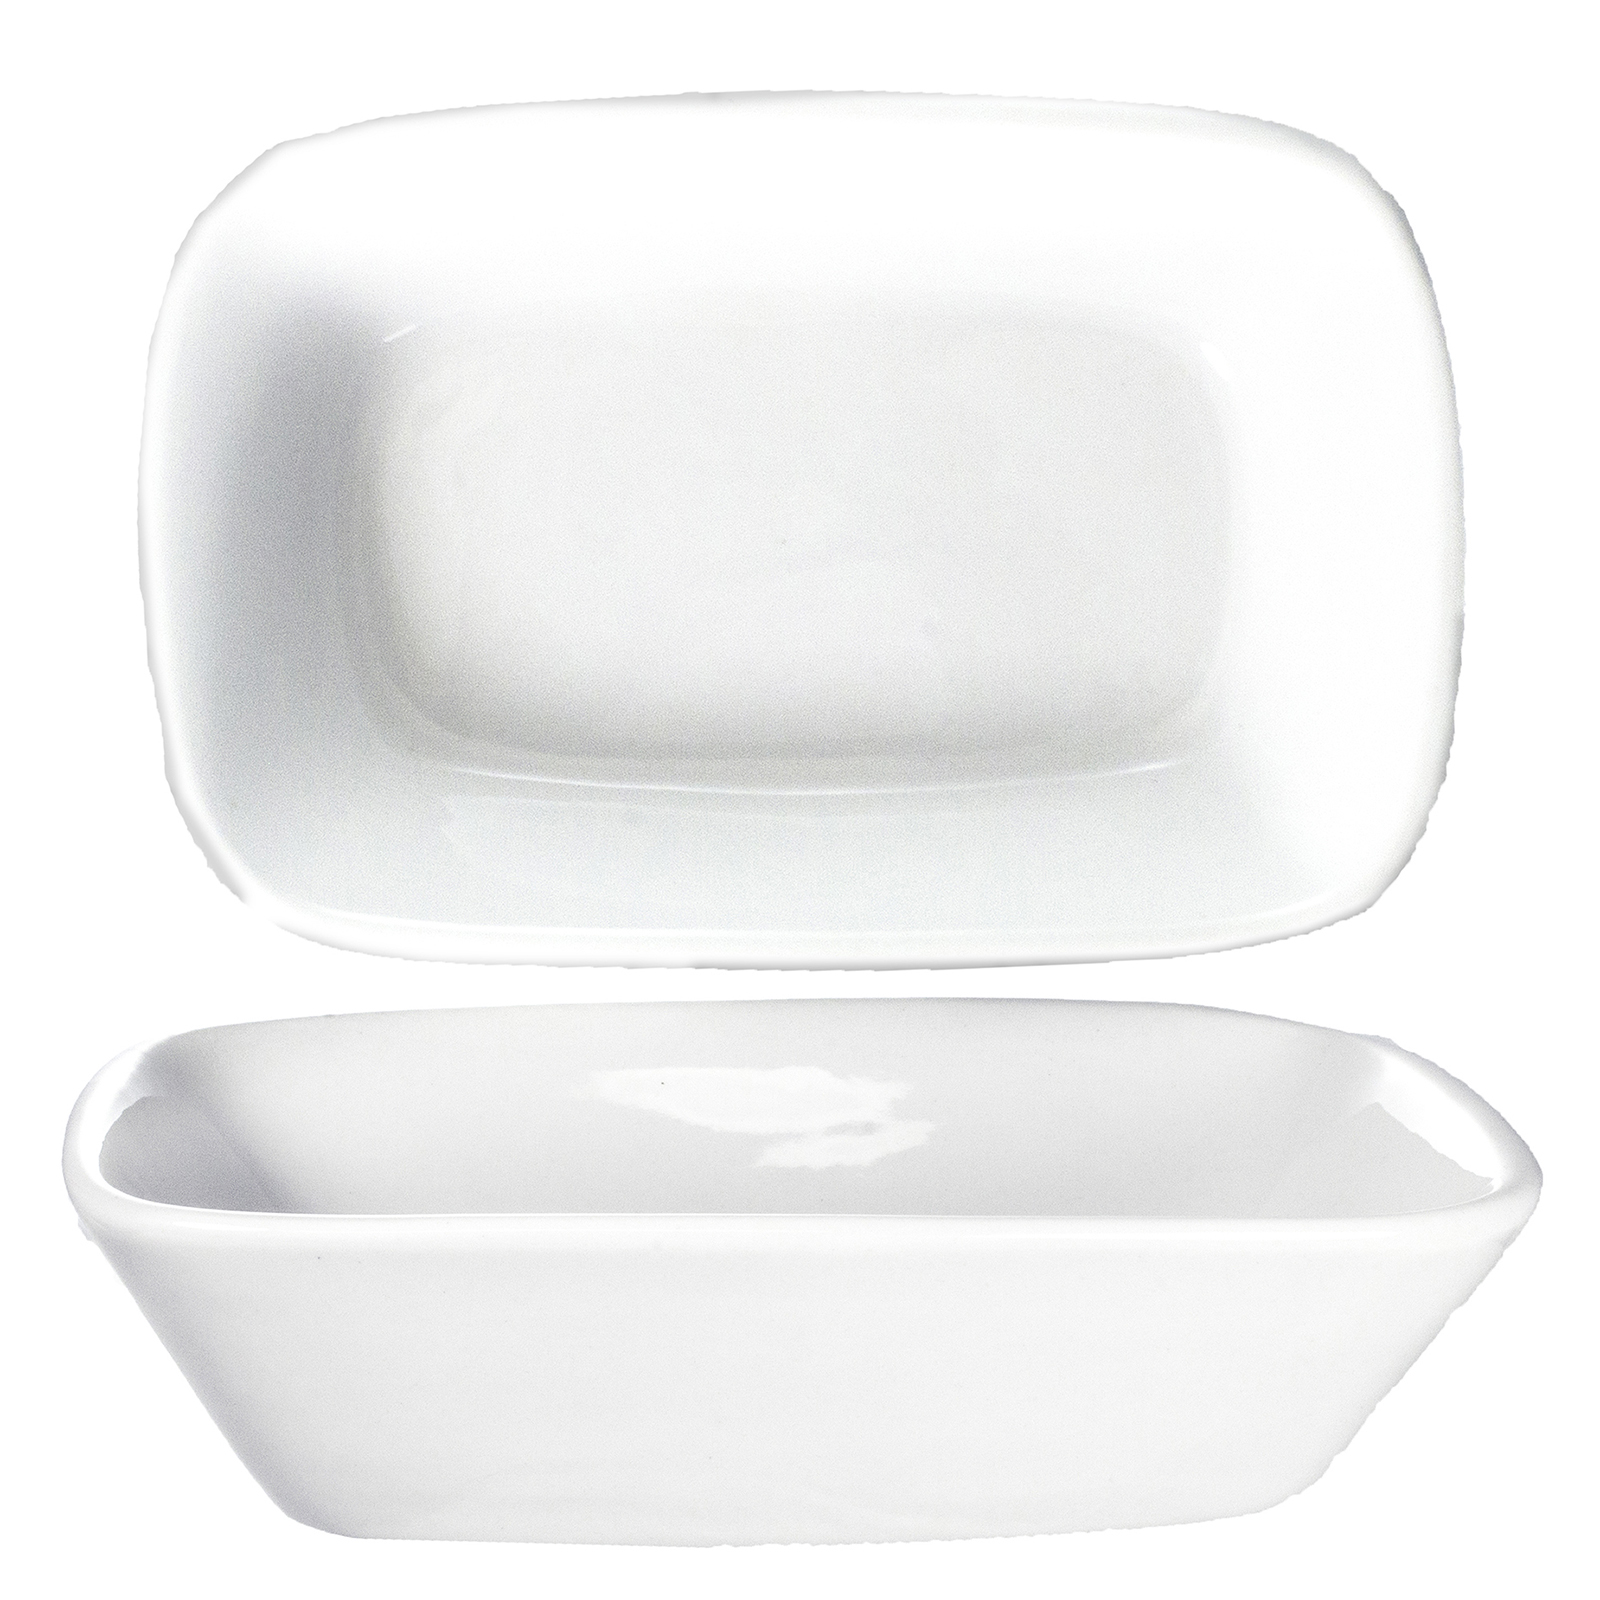 International Tableware QP-64 china, bowl,  9 - 16 oz